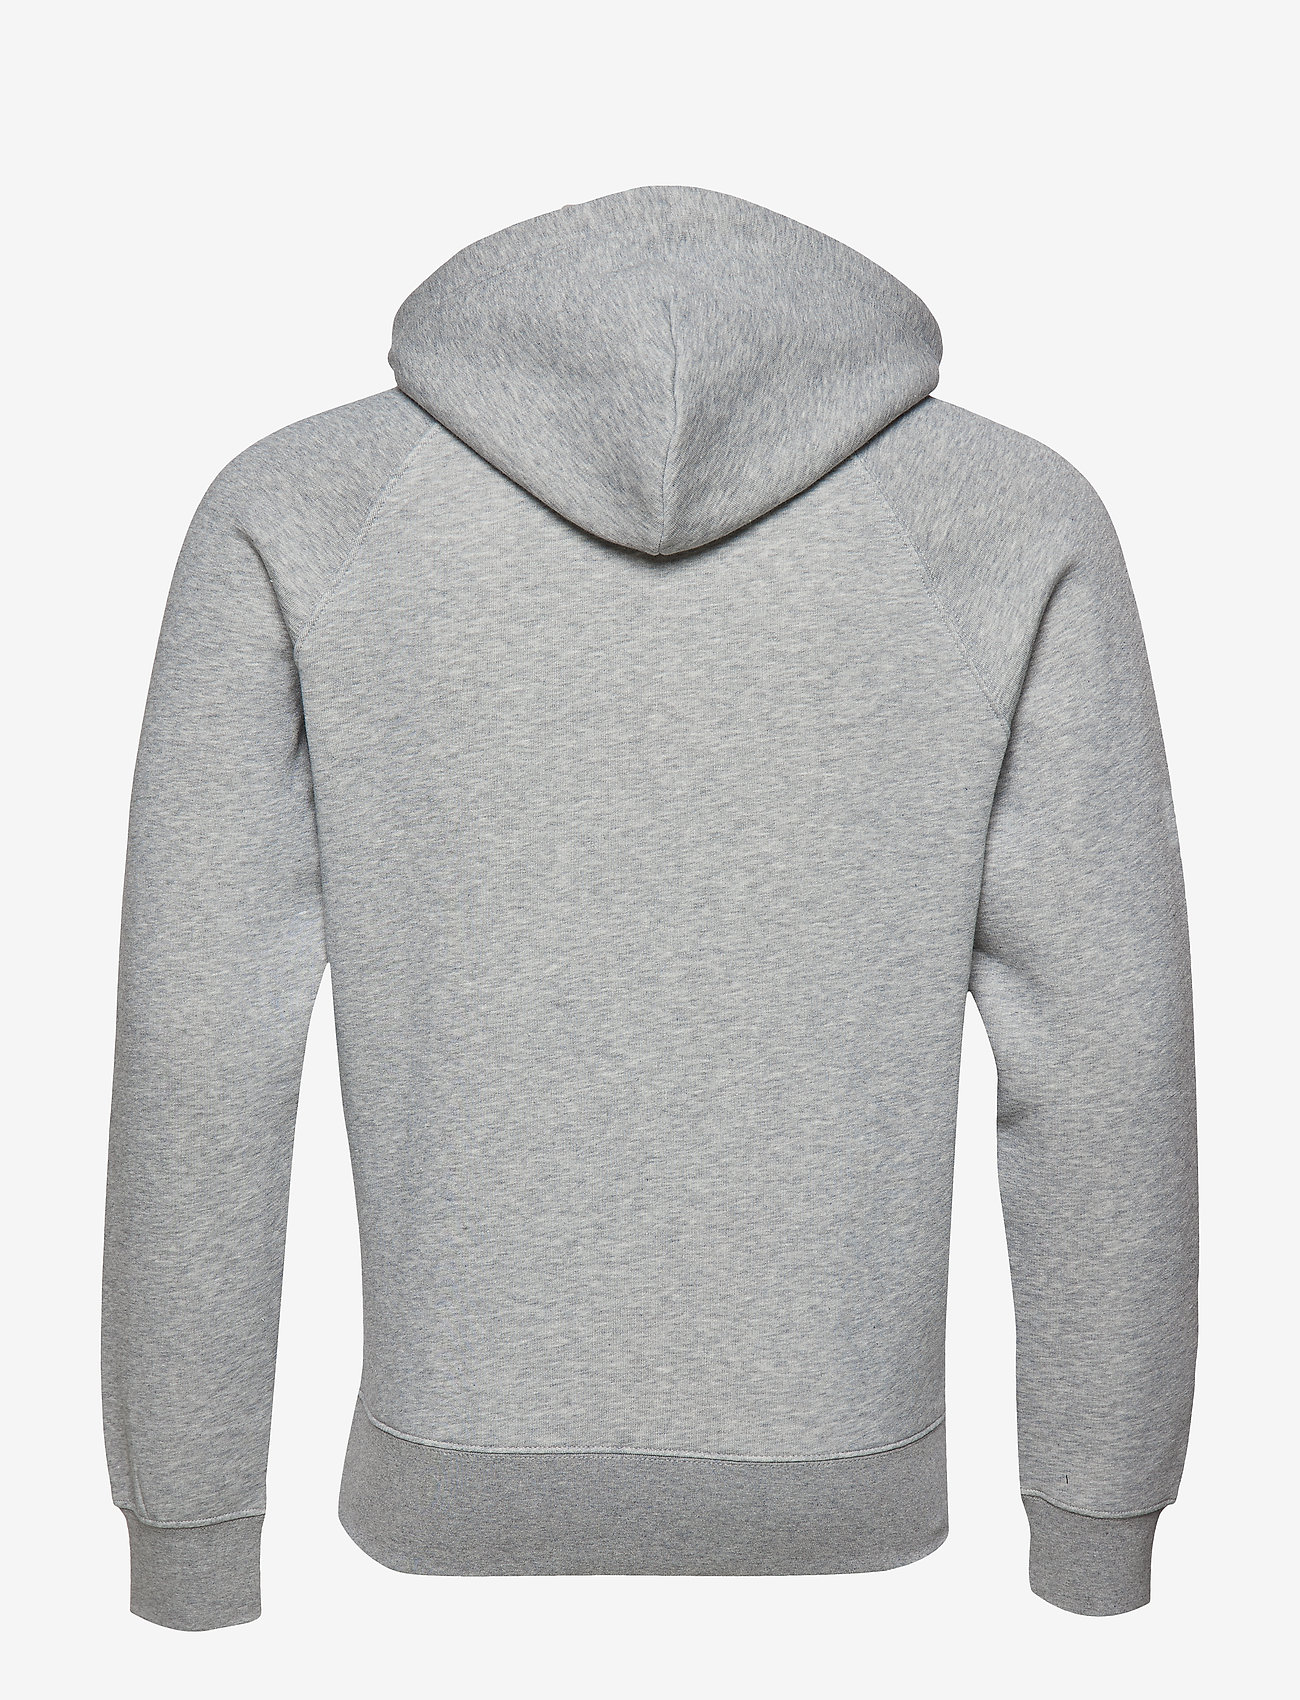 GANT - SHIELD HOODIE - kapuzenpullover - grey melange - 1